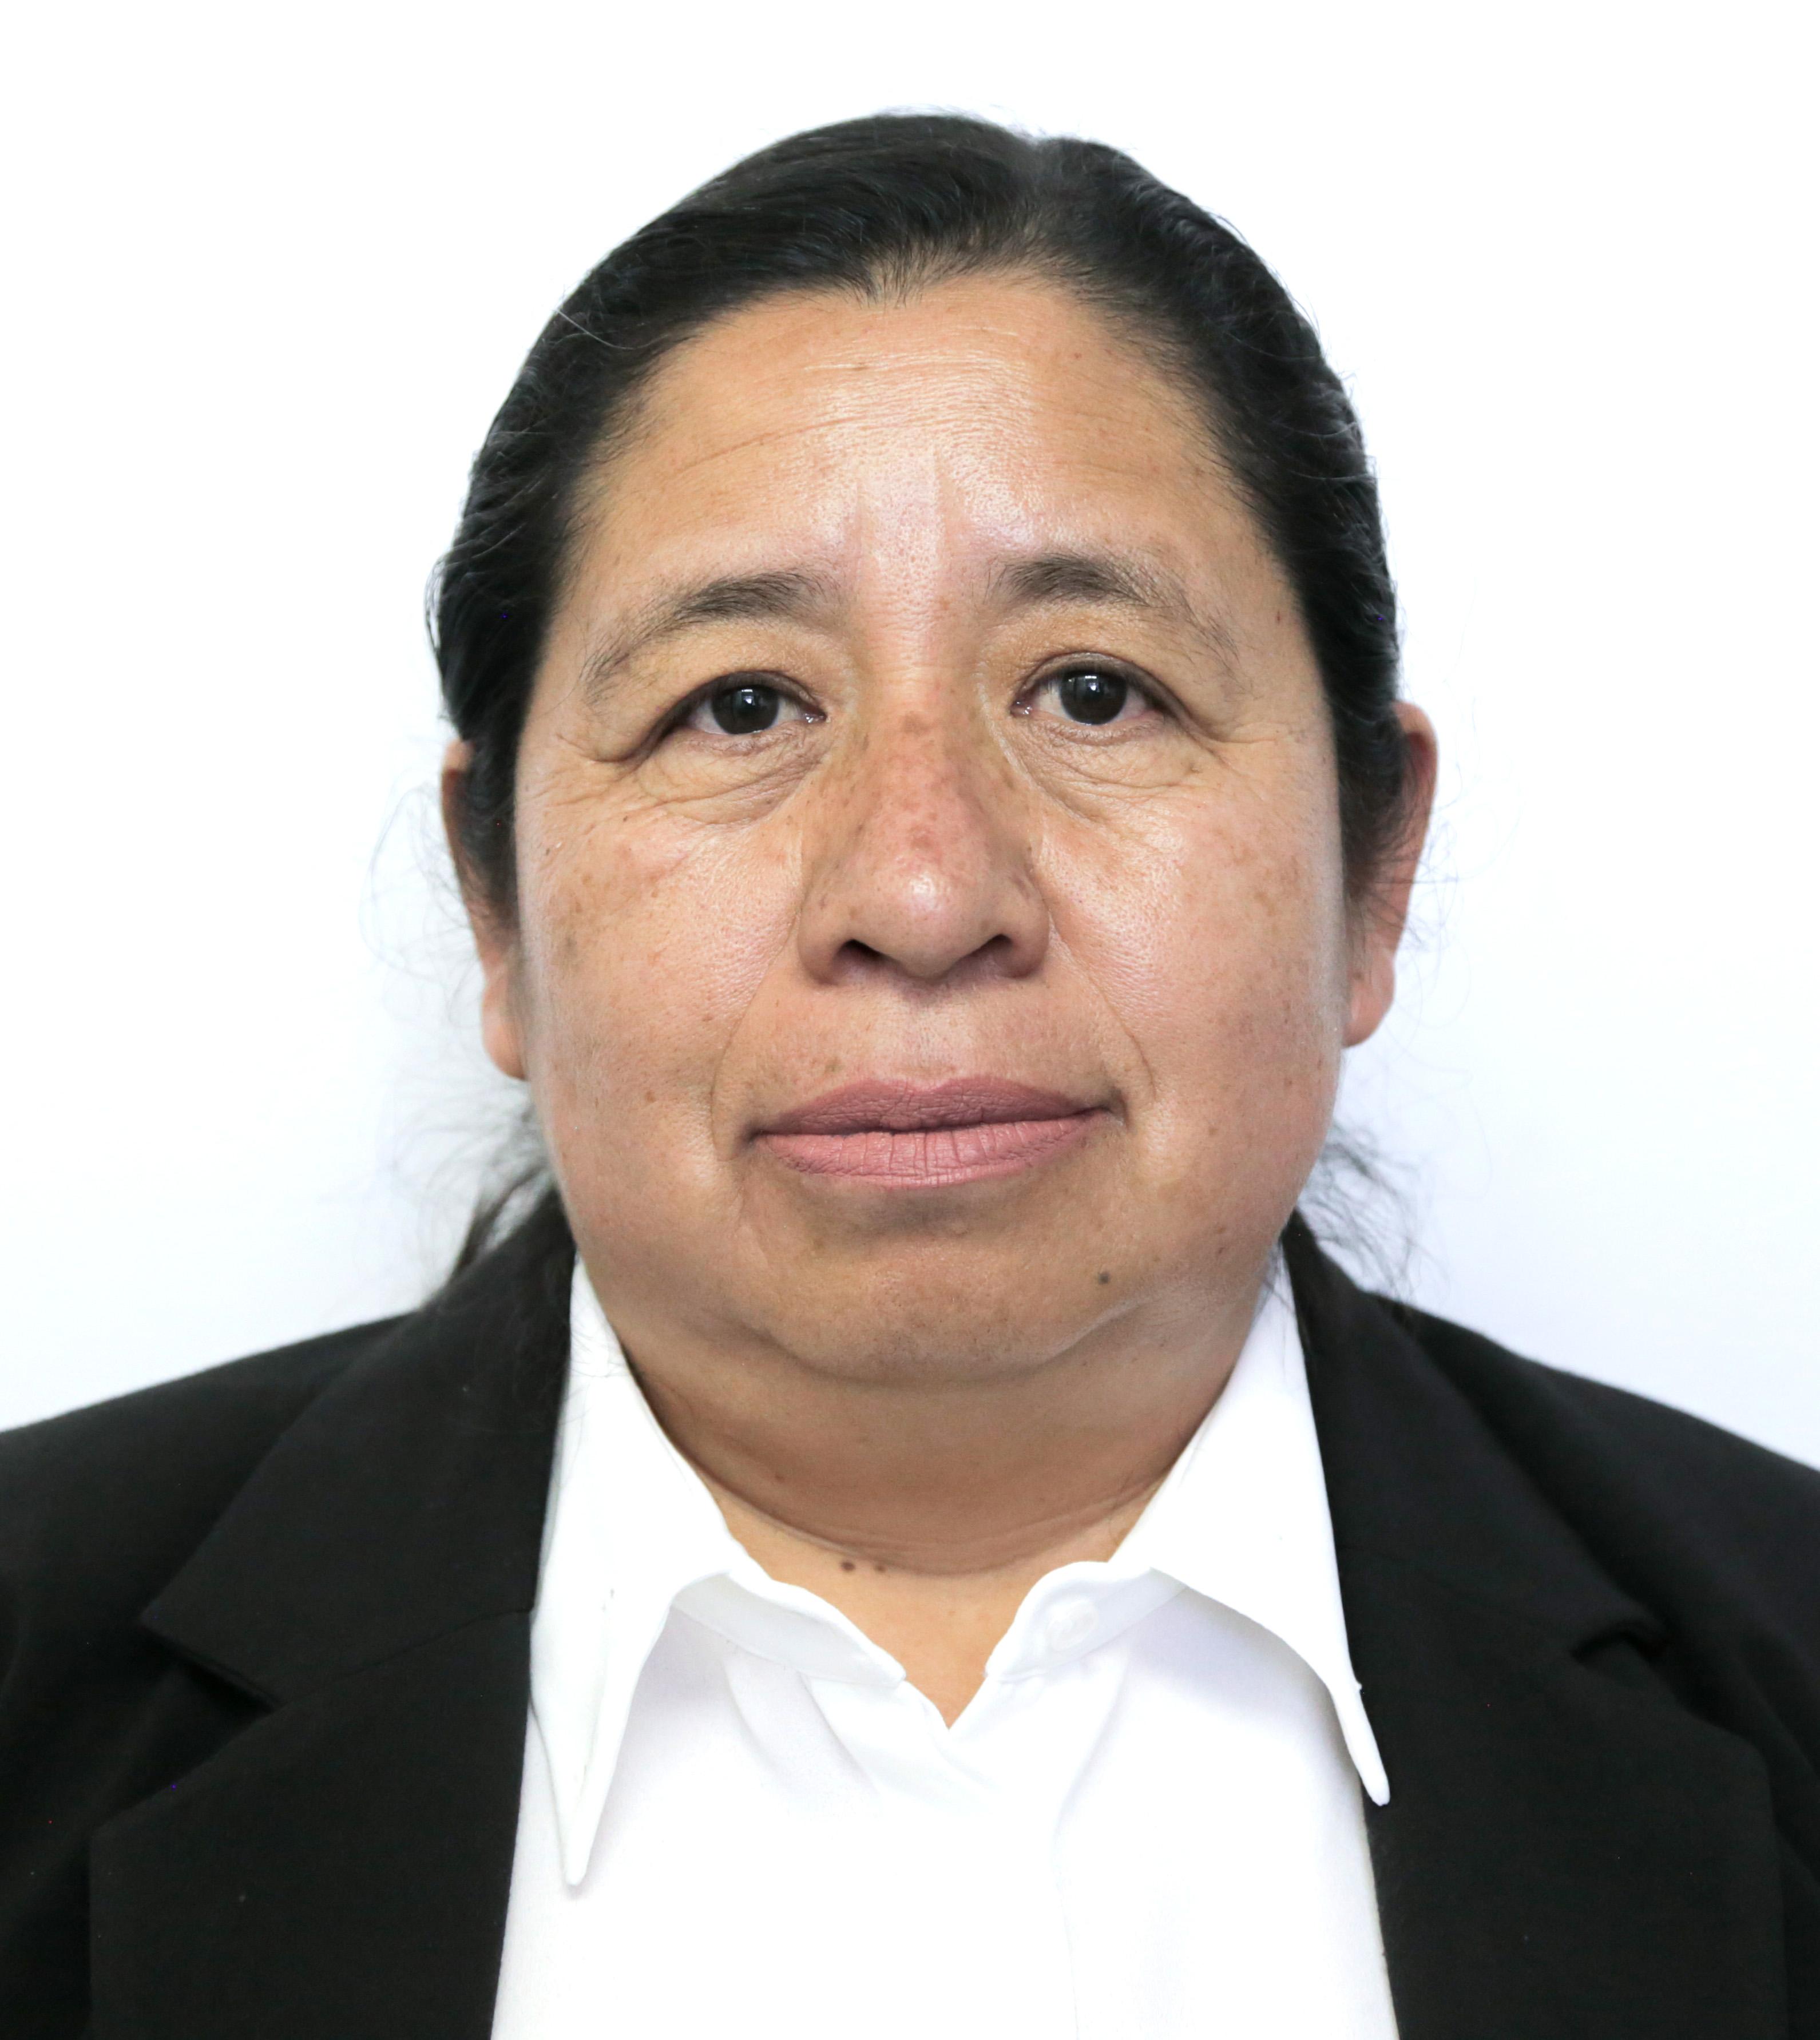 Fabiola Sandoval salas